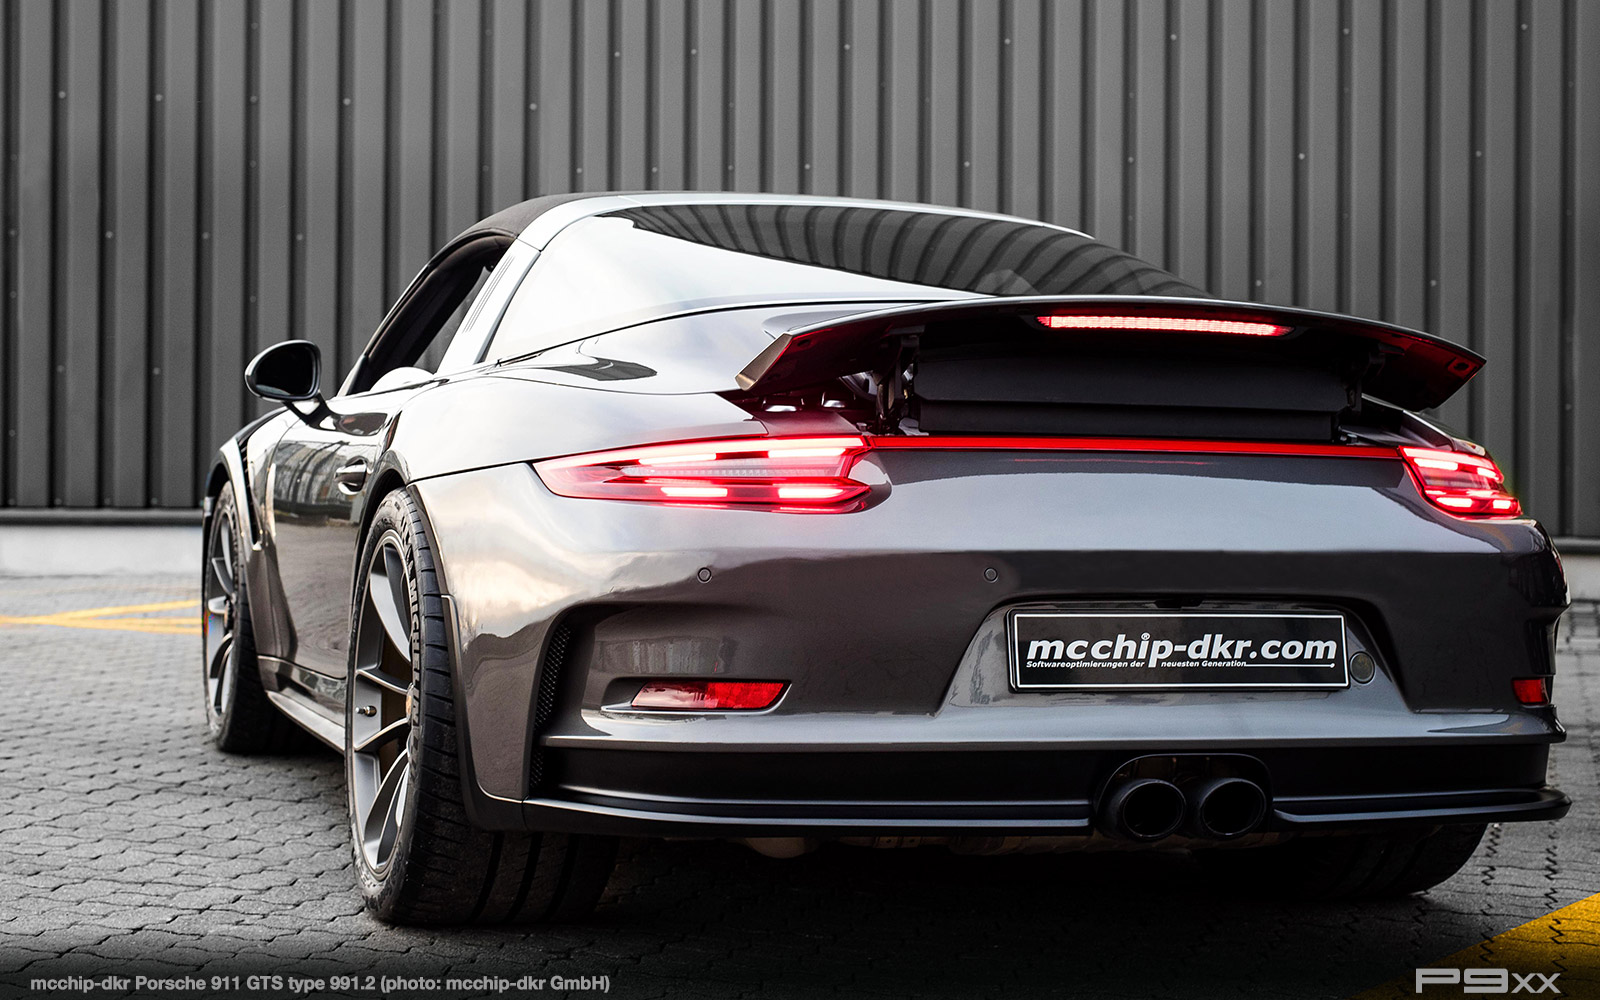 mcchip-dkr-porsche-911-9912-targa-4-gts-712